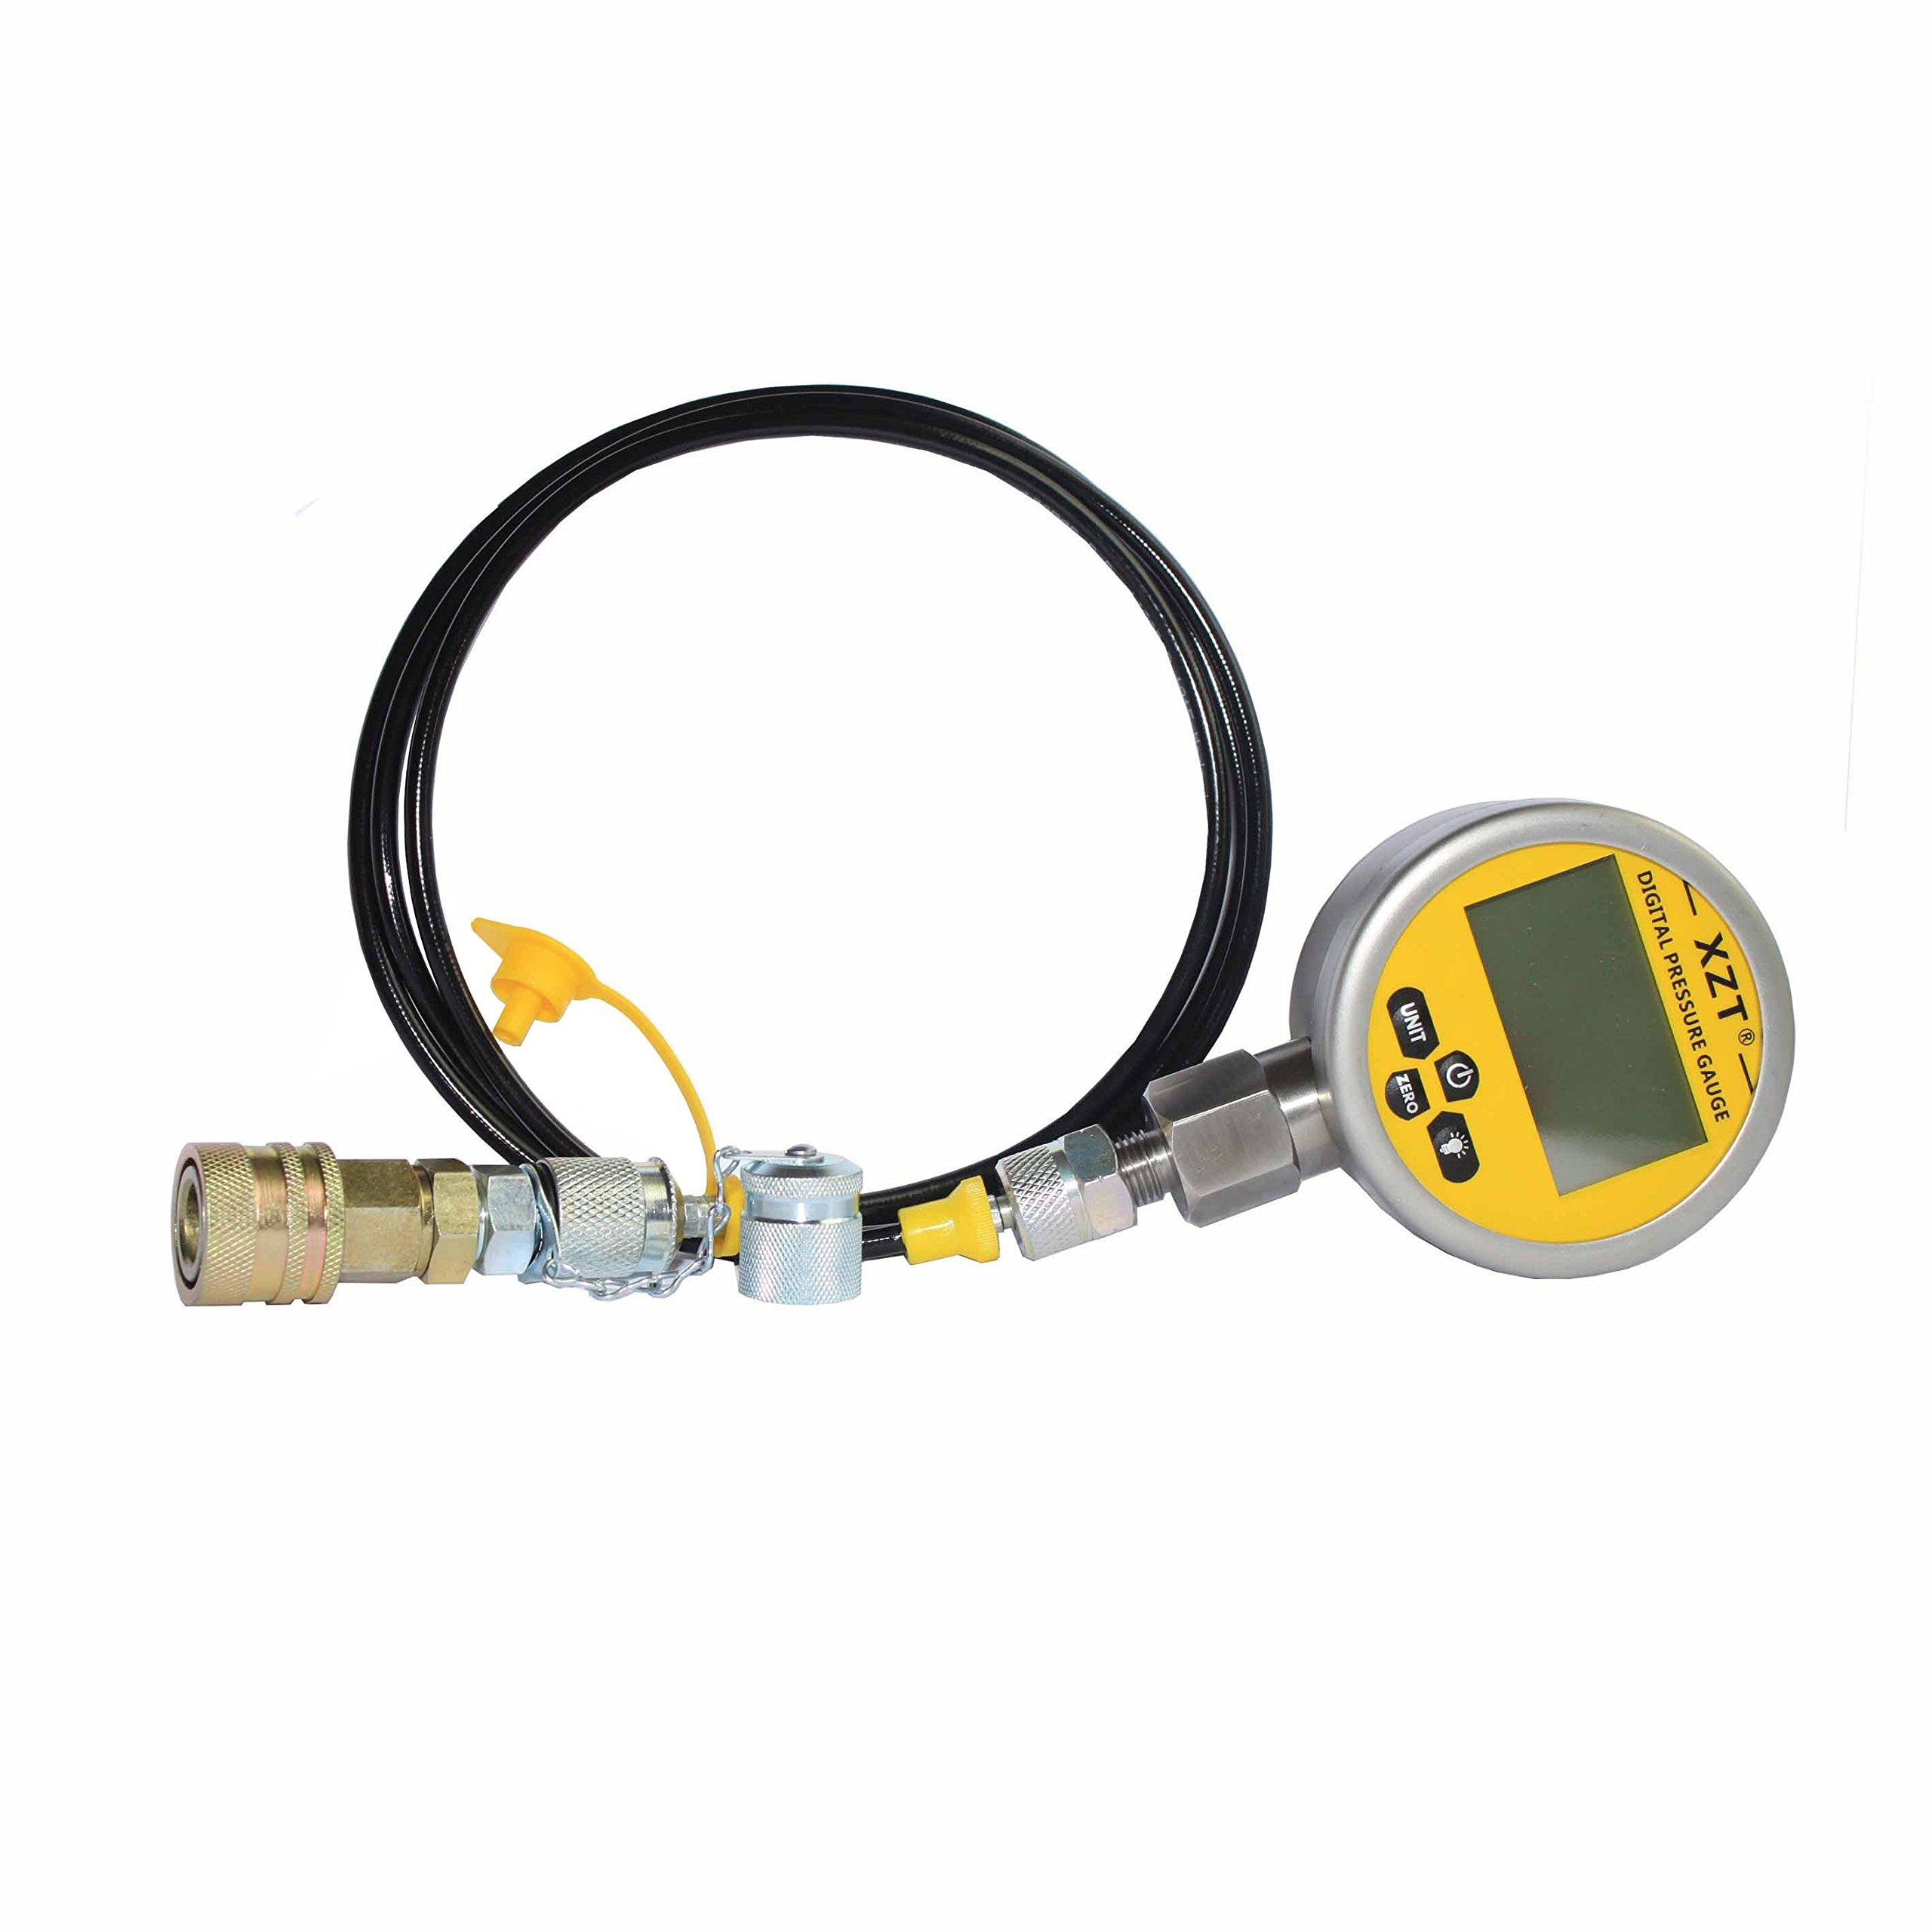 Buy XZT Vov 10000psi Digital Hydraulic Pressure Test